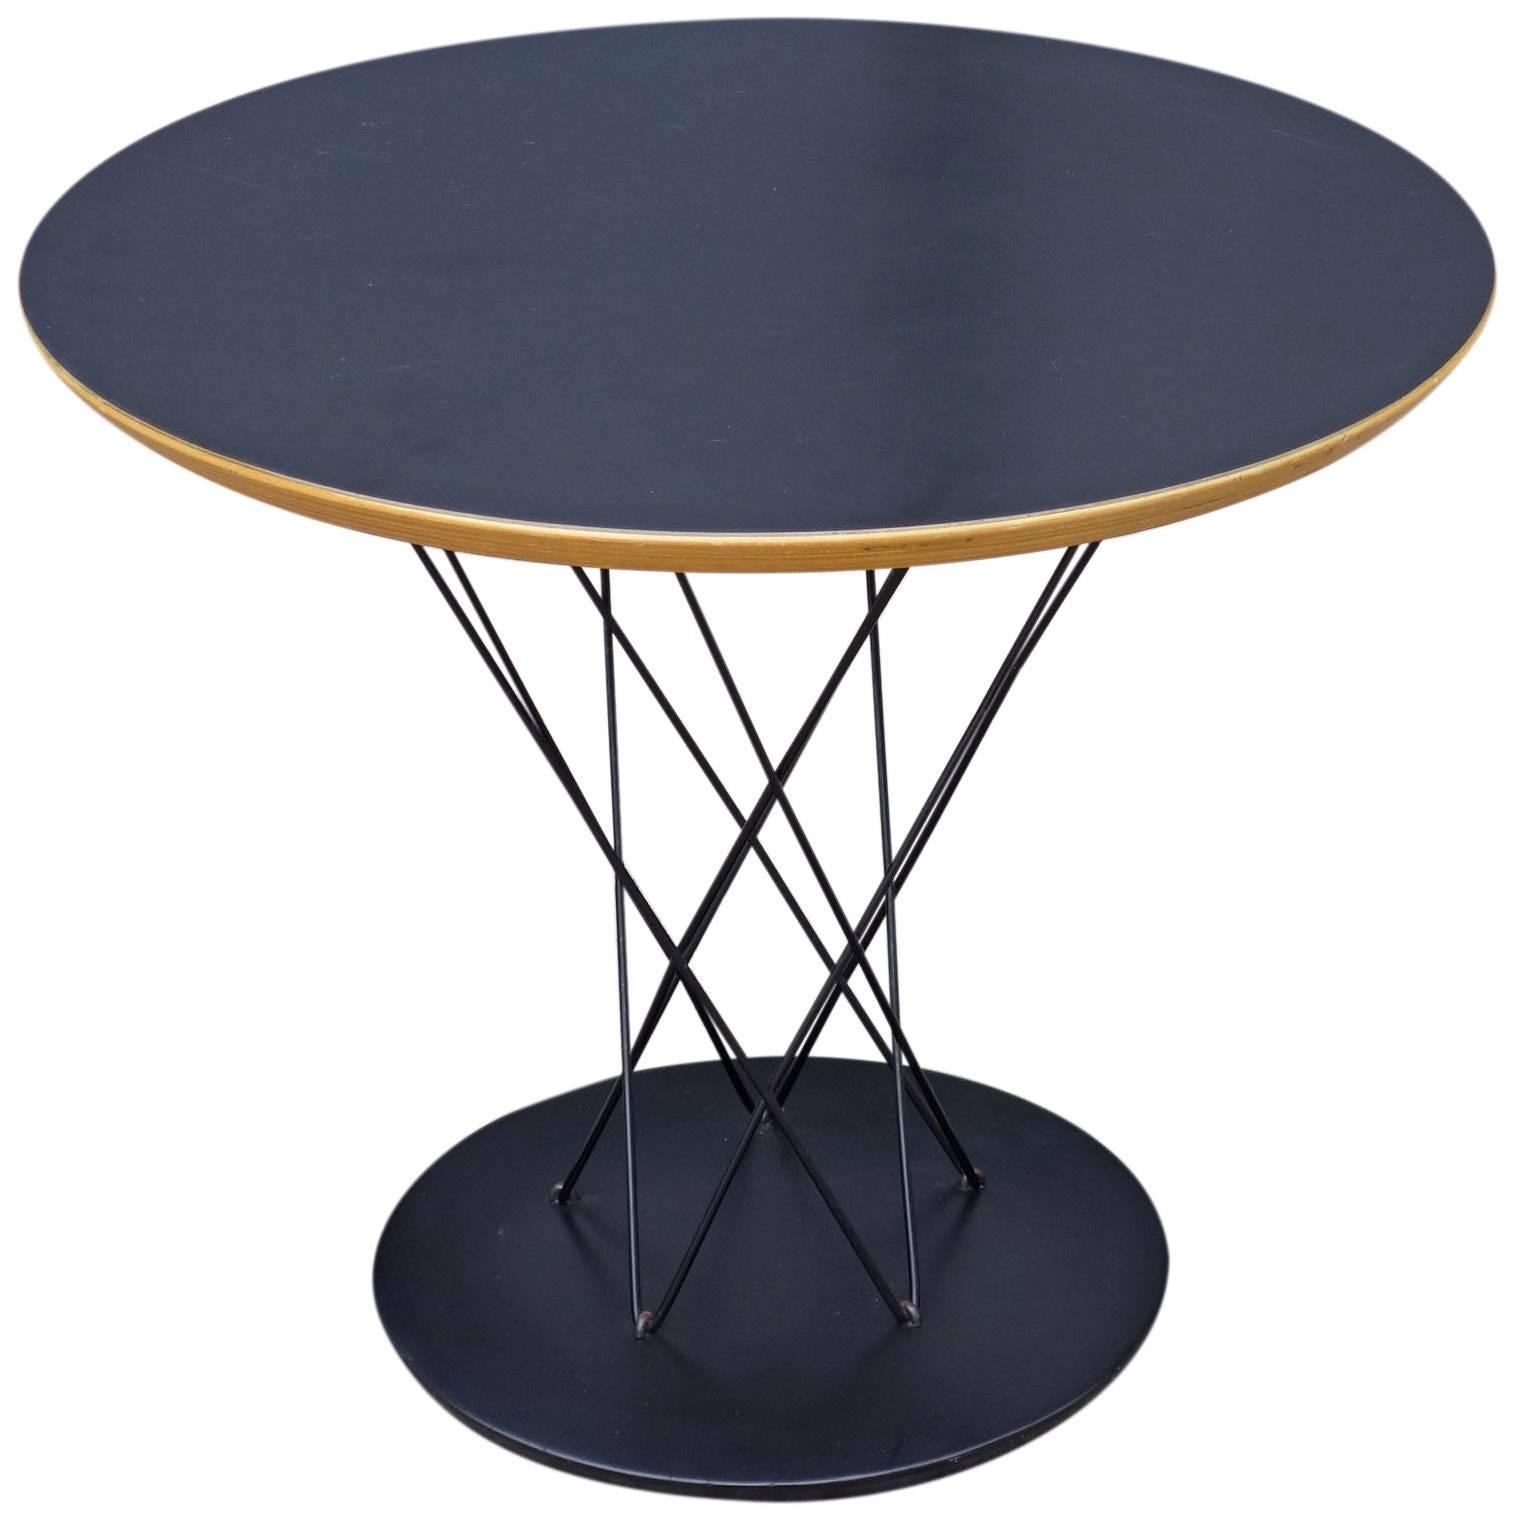 amazing Noguchi Cyclone Part - 7: Midcentury Isamu Noguchi Cyclone Side Table For Sale